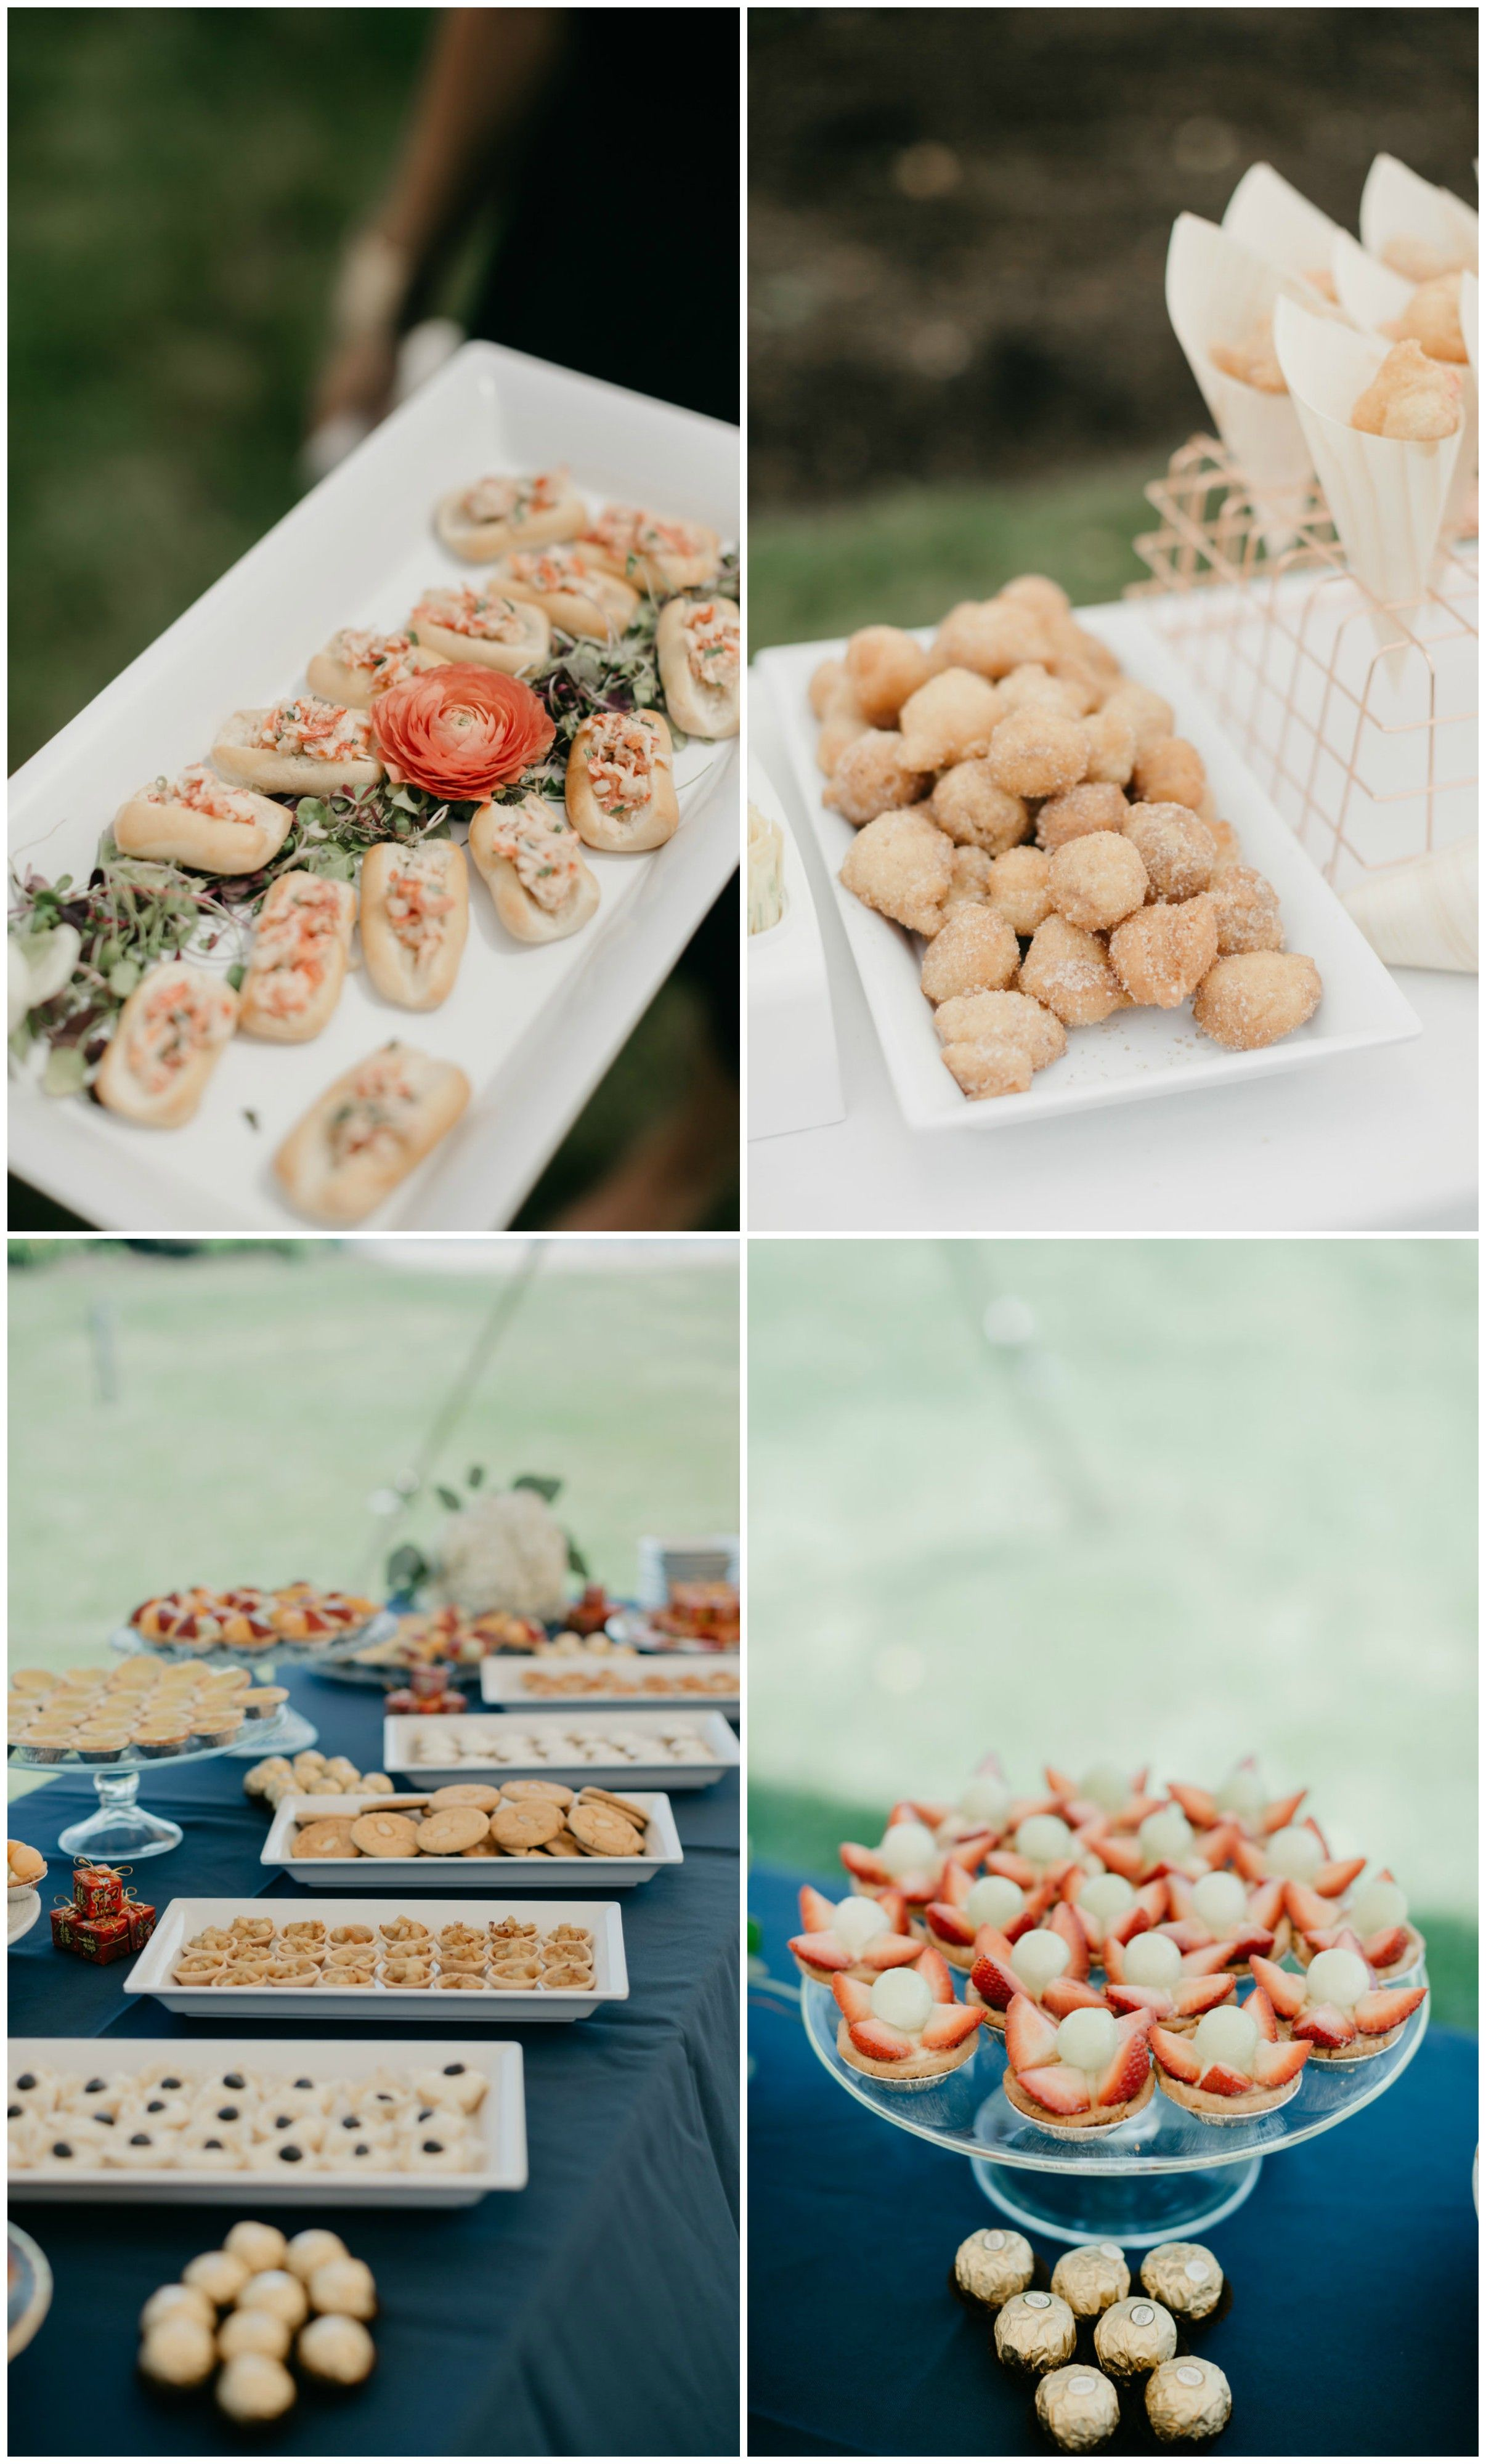 Wedding Food Passed Appetizers Wedding Desserts Wedding